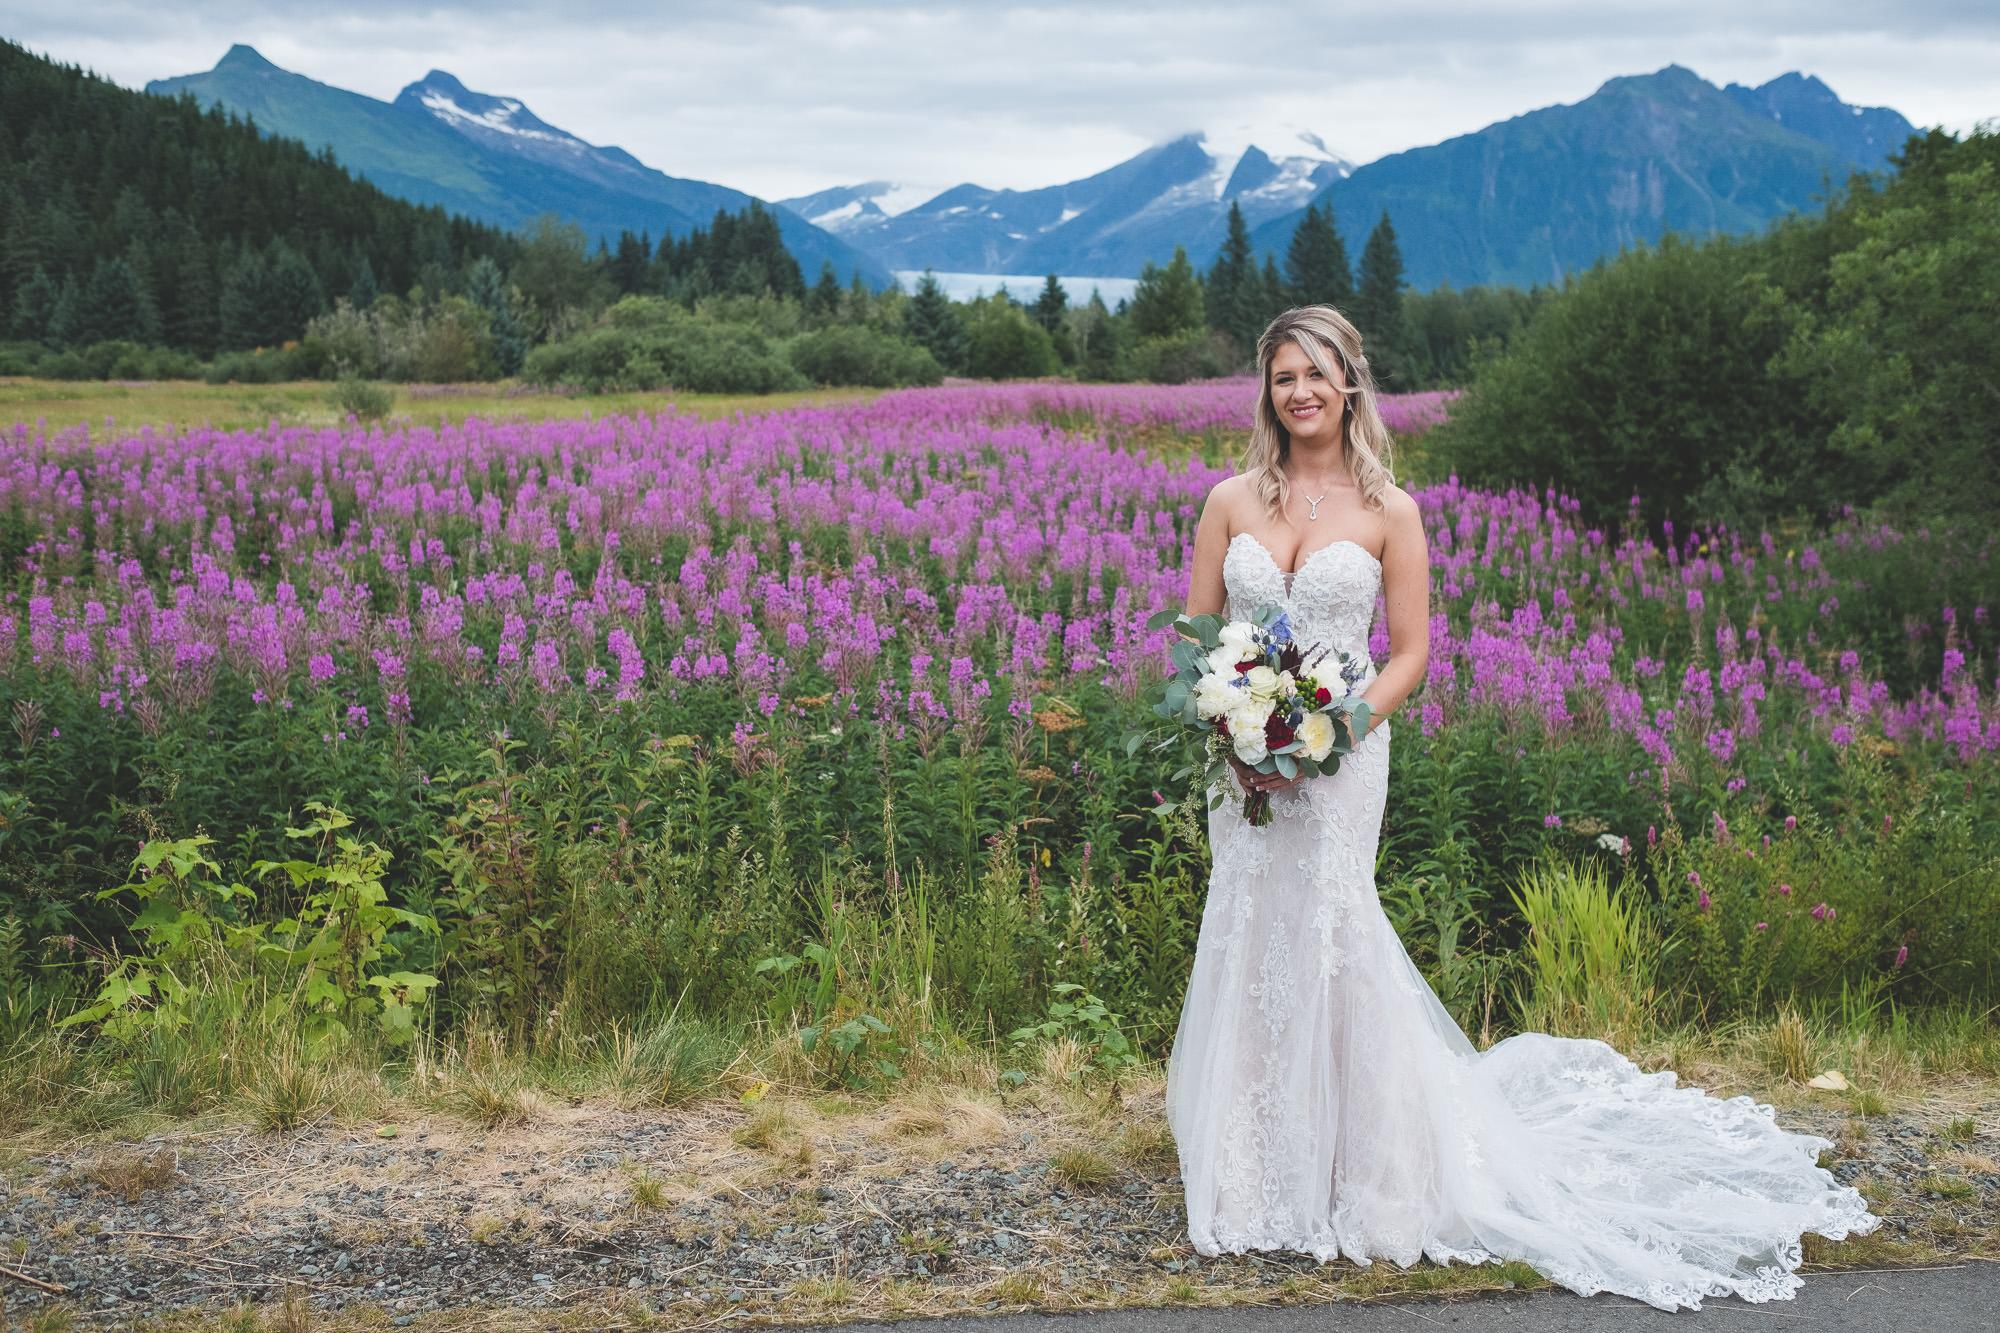 Billy Jessica Wedding Slideshow-45.jpg